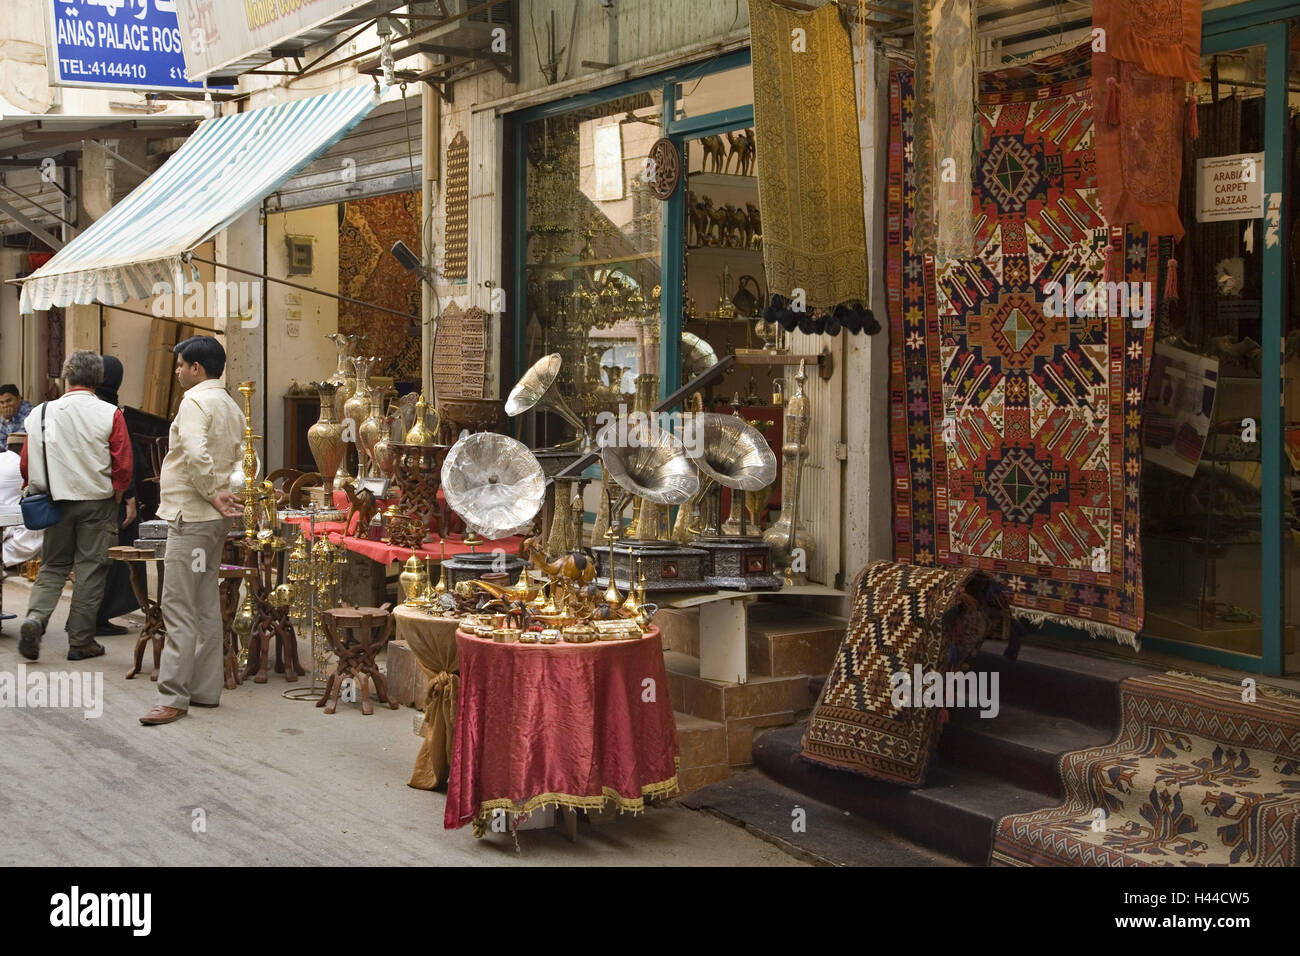 Arabia Saudita, provincia Riyadh, Riyadh, tiendas, turistas, Imagen De Stock